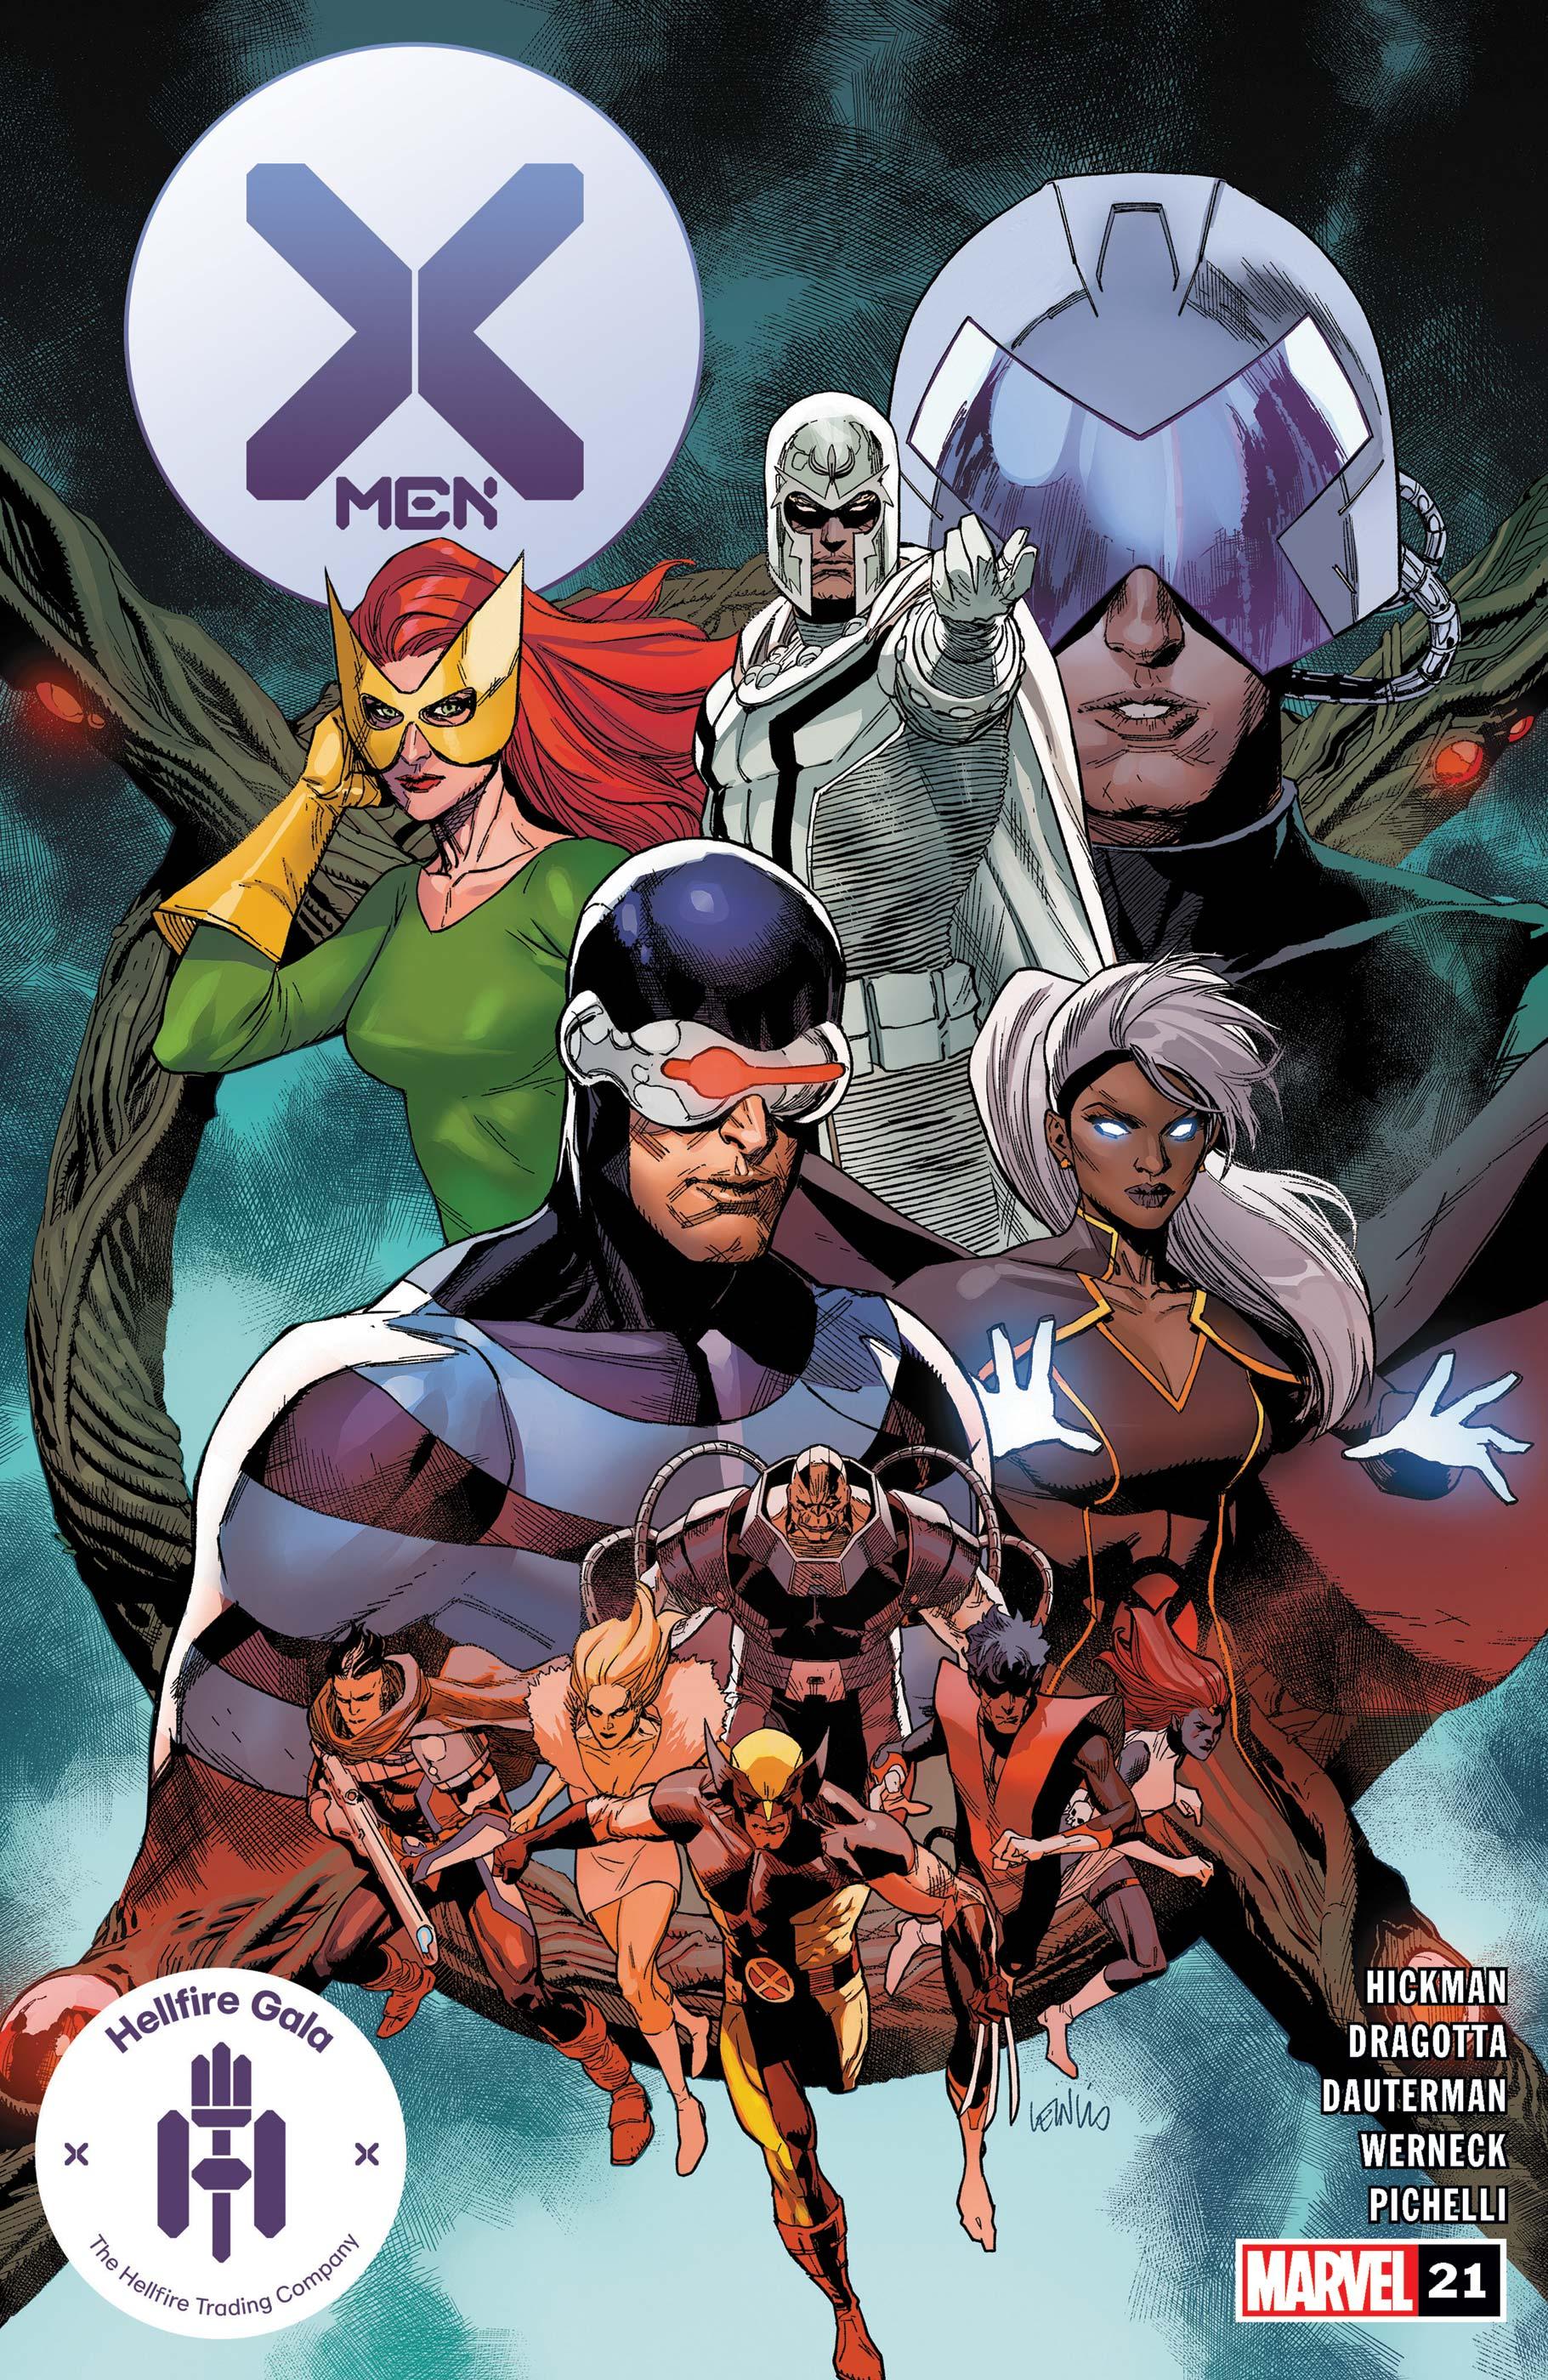 X-Men (2019) #21